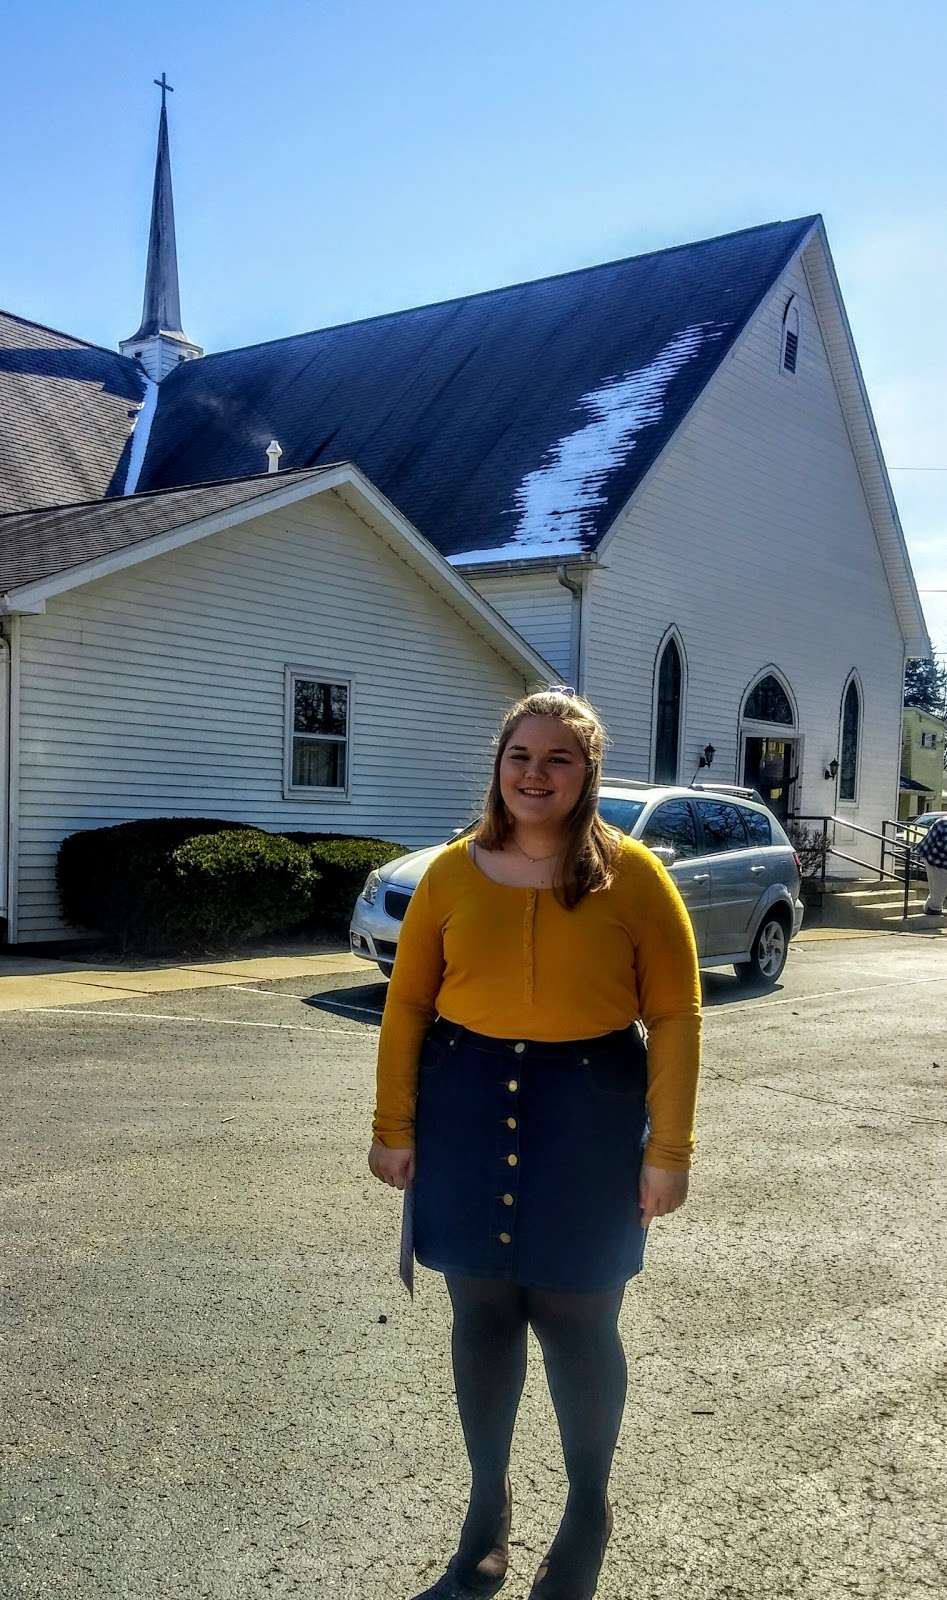 Huntsville Good Shepherd Church - church    Photo 3 of 4   Address: 3126 Market St, Pendleton, IN 46064, USA   Phone: (765) 778-2993